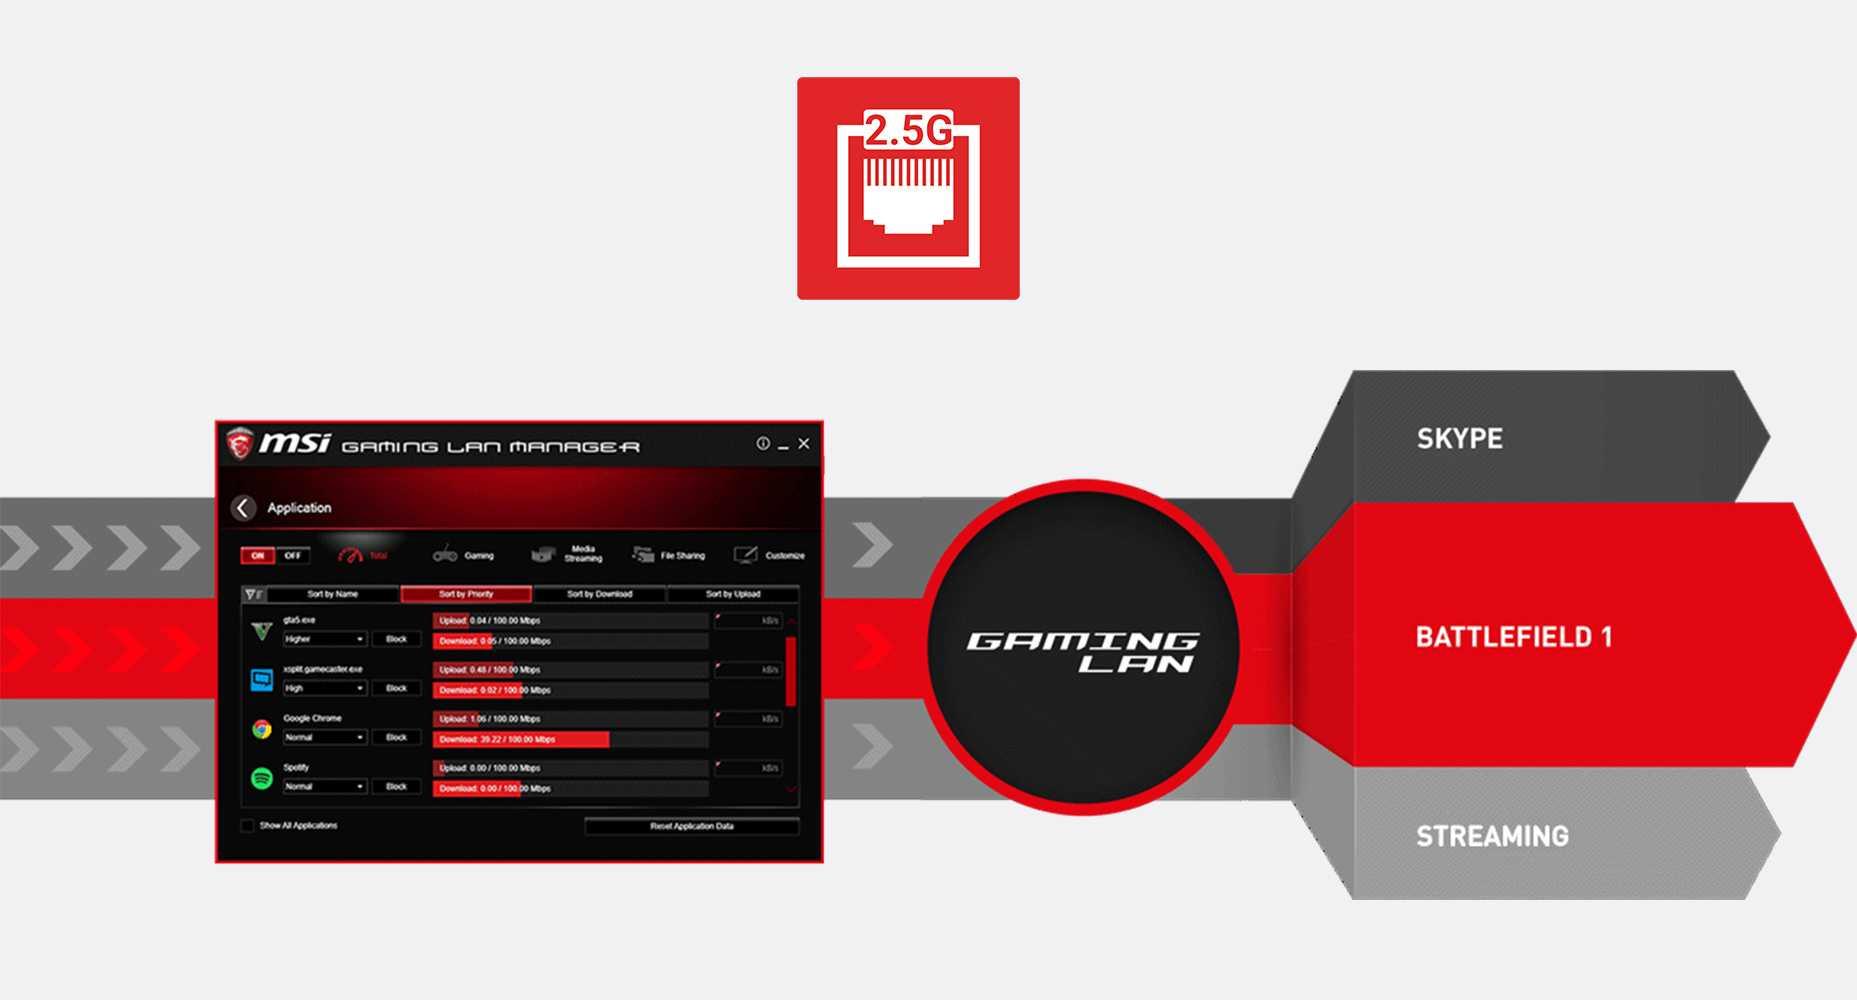 MSI THE LOWEST LATENCY 2.5G GAMING LAN